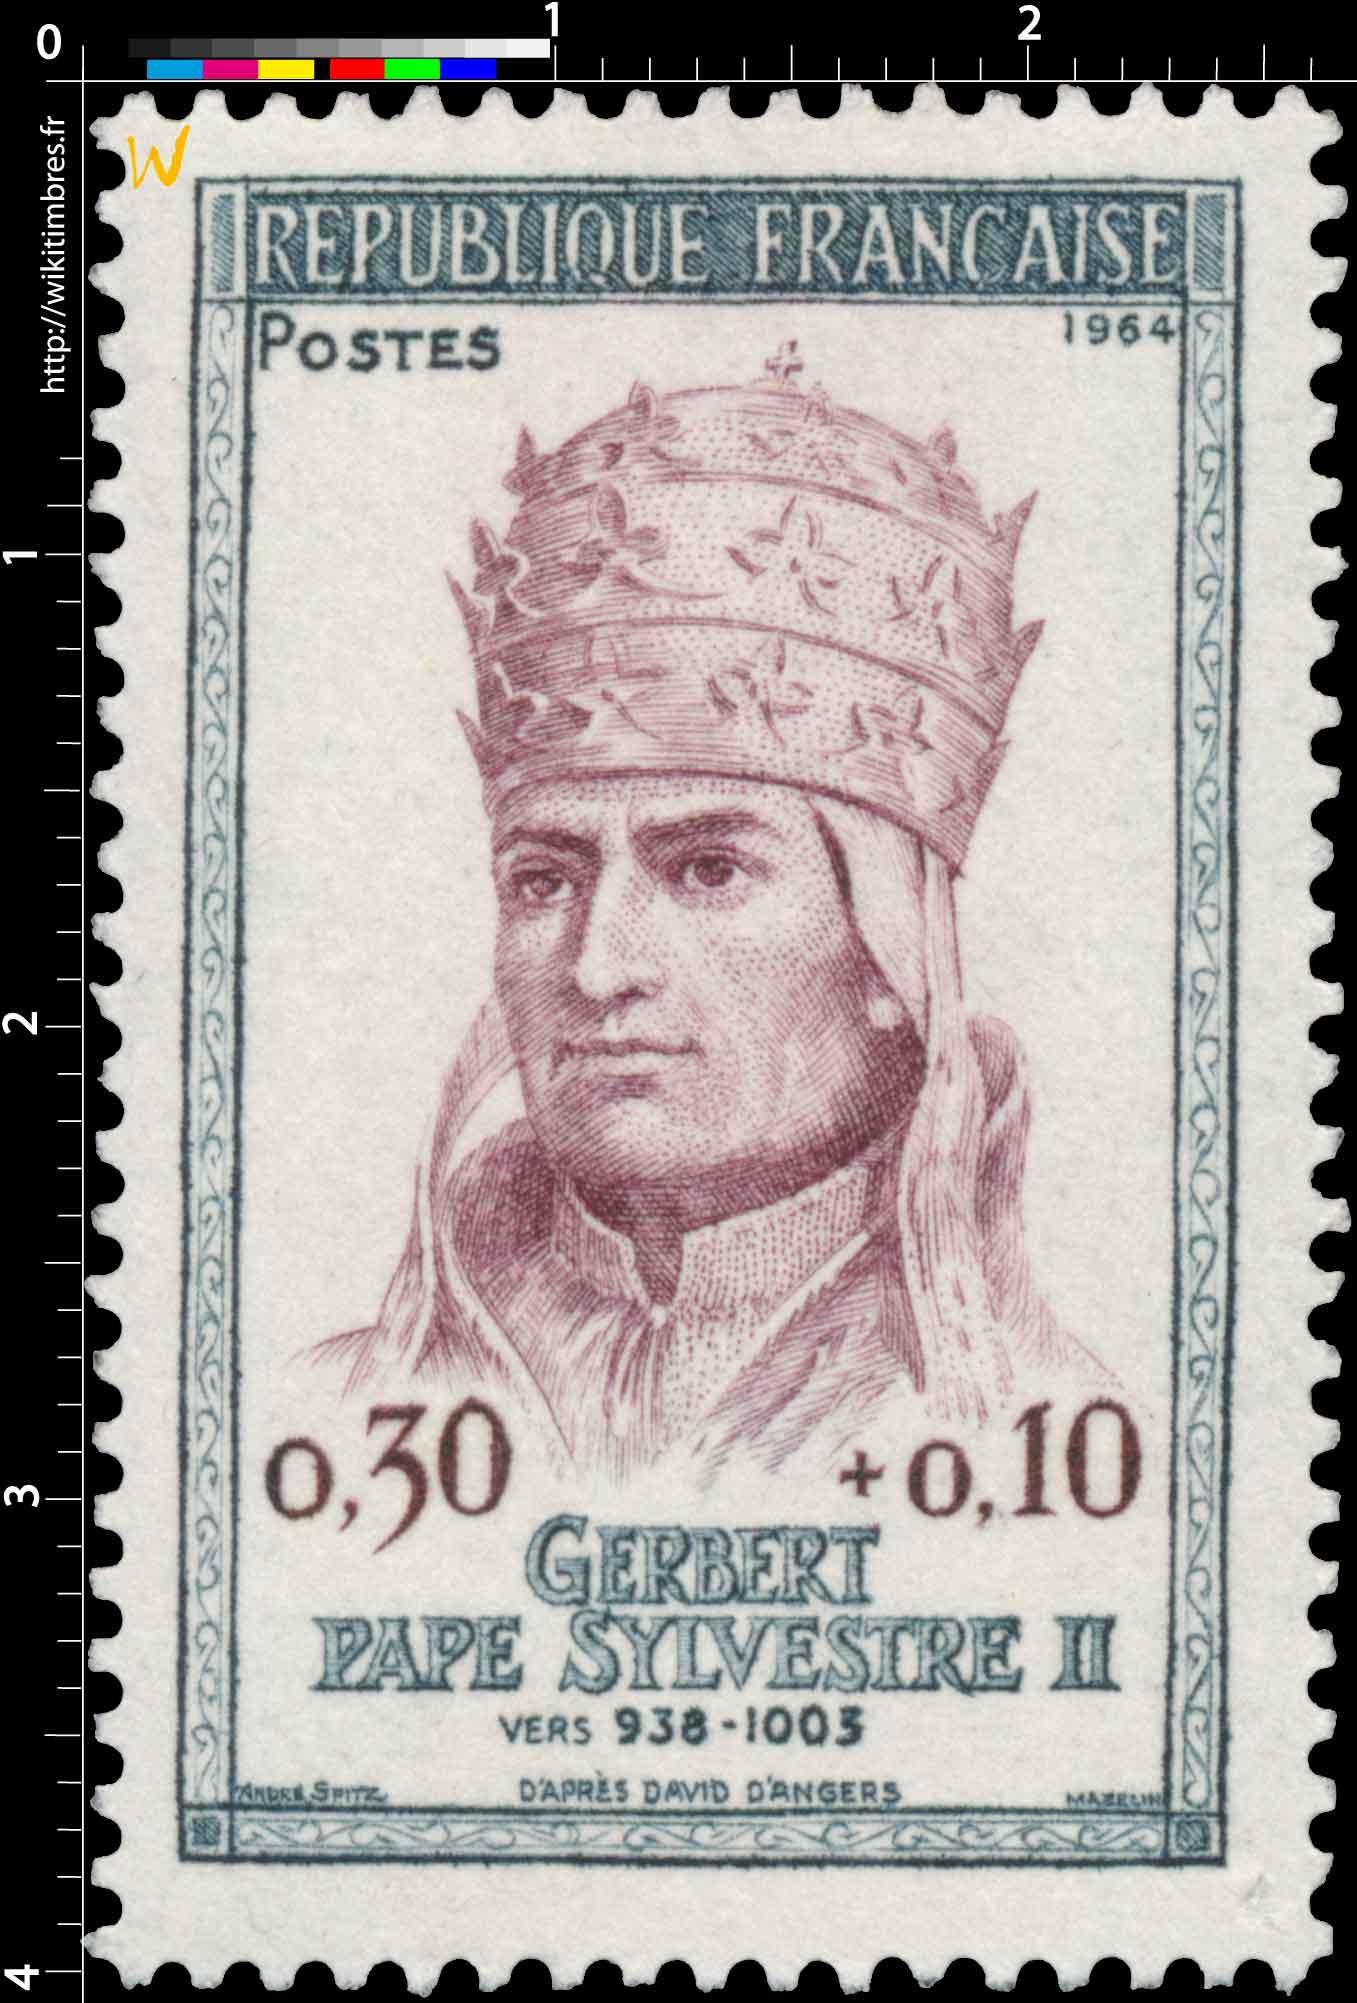 1964 GERBERT PAPE SYLVESTRE II VERS 938-1003